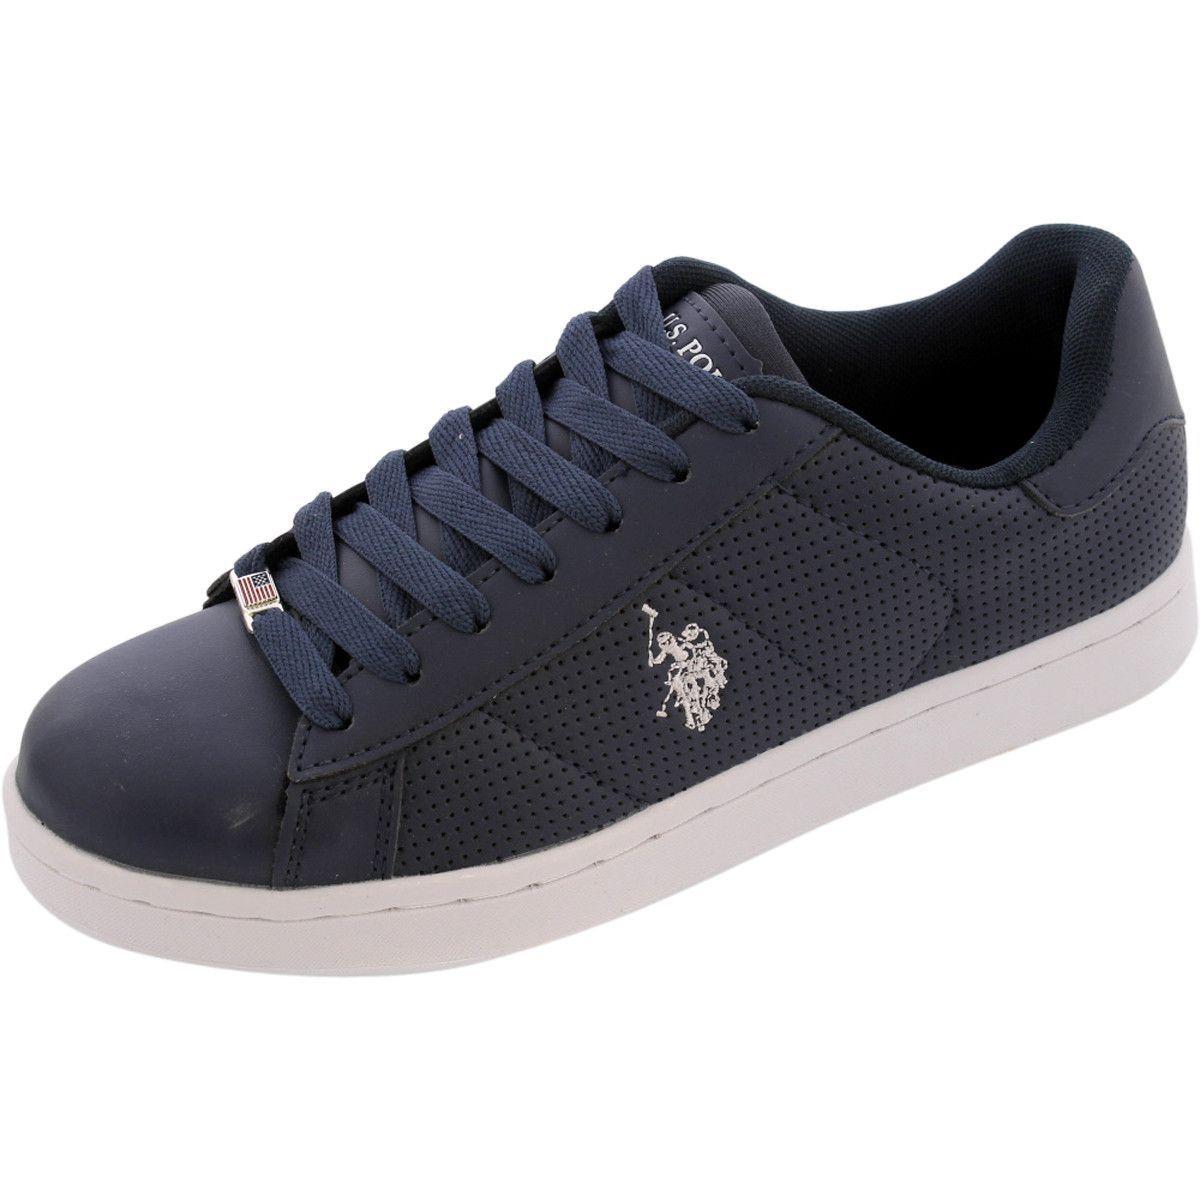 US Polo Assn. - Men's Montana U Perf Sneakers - Navy